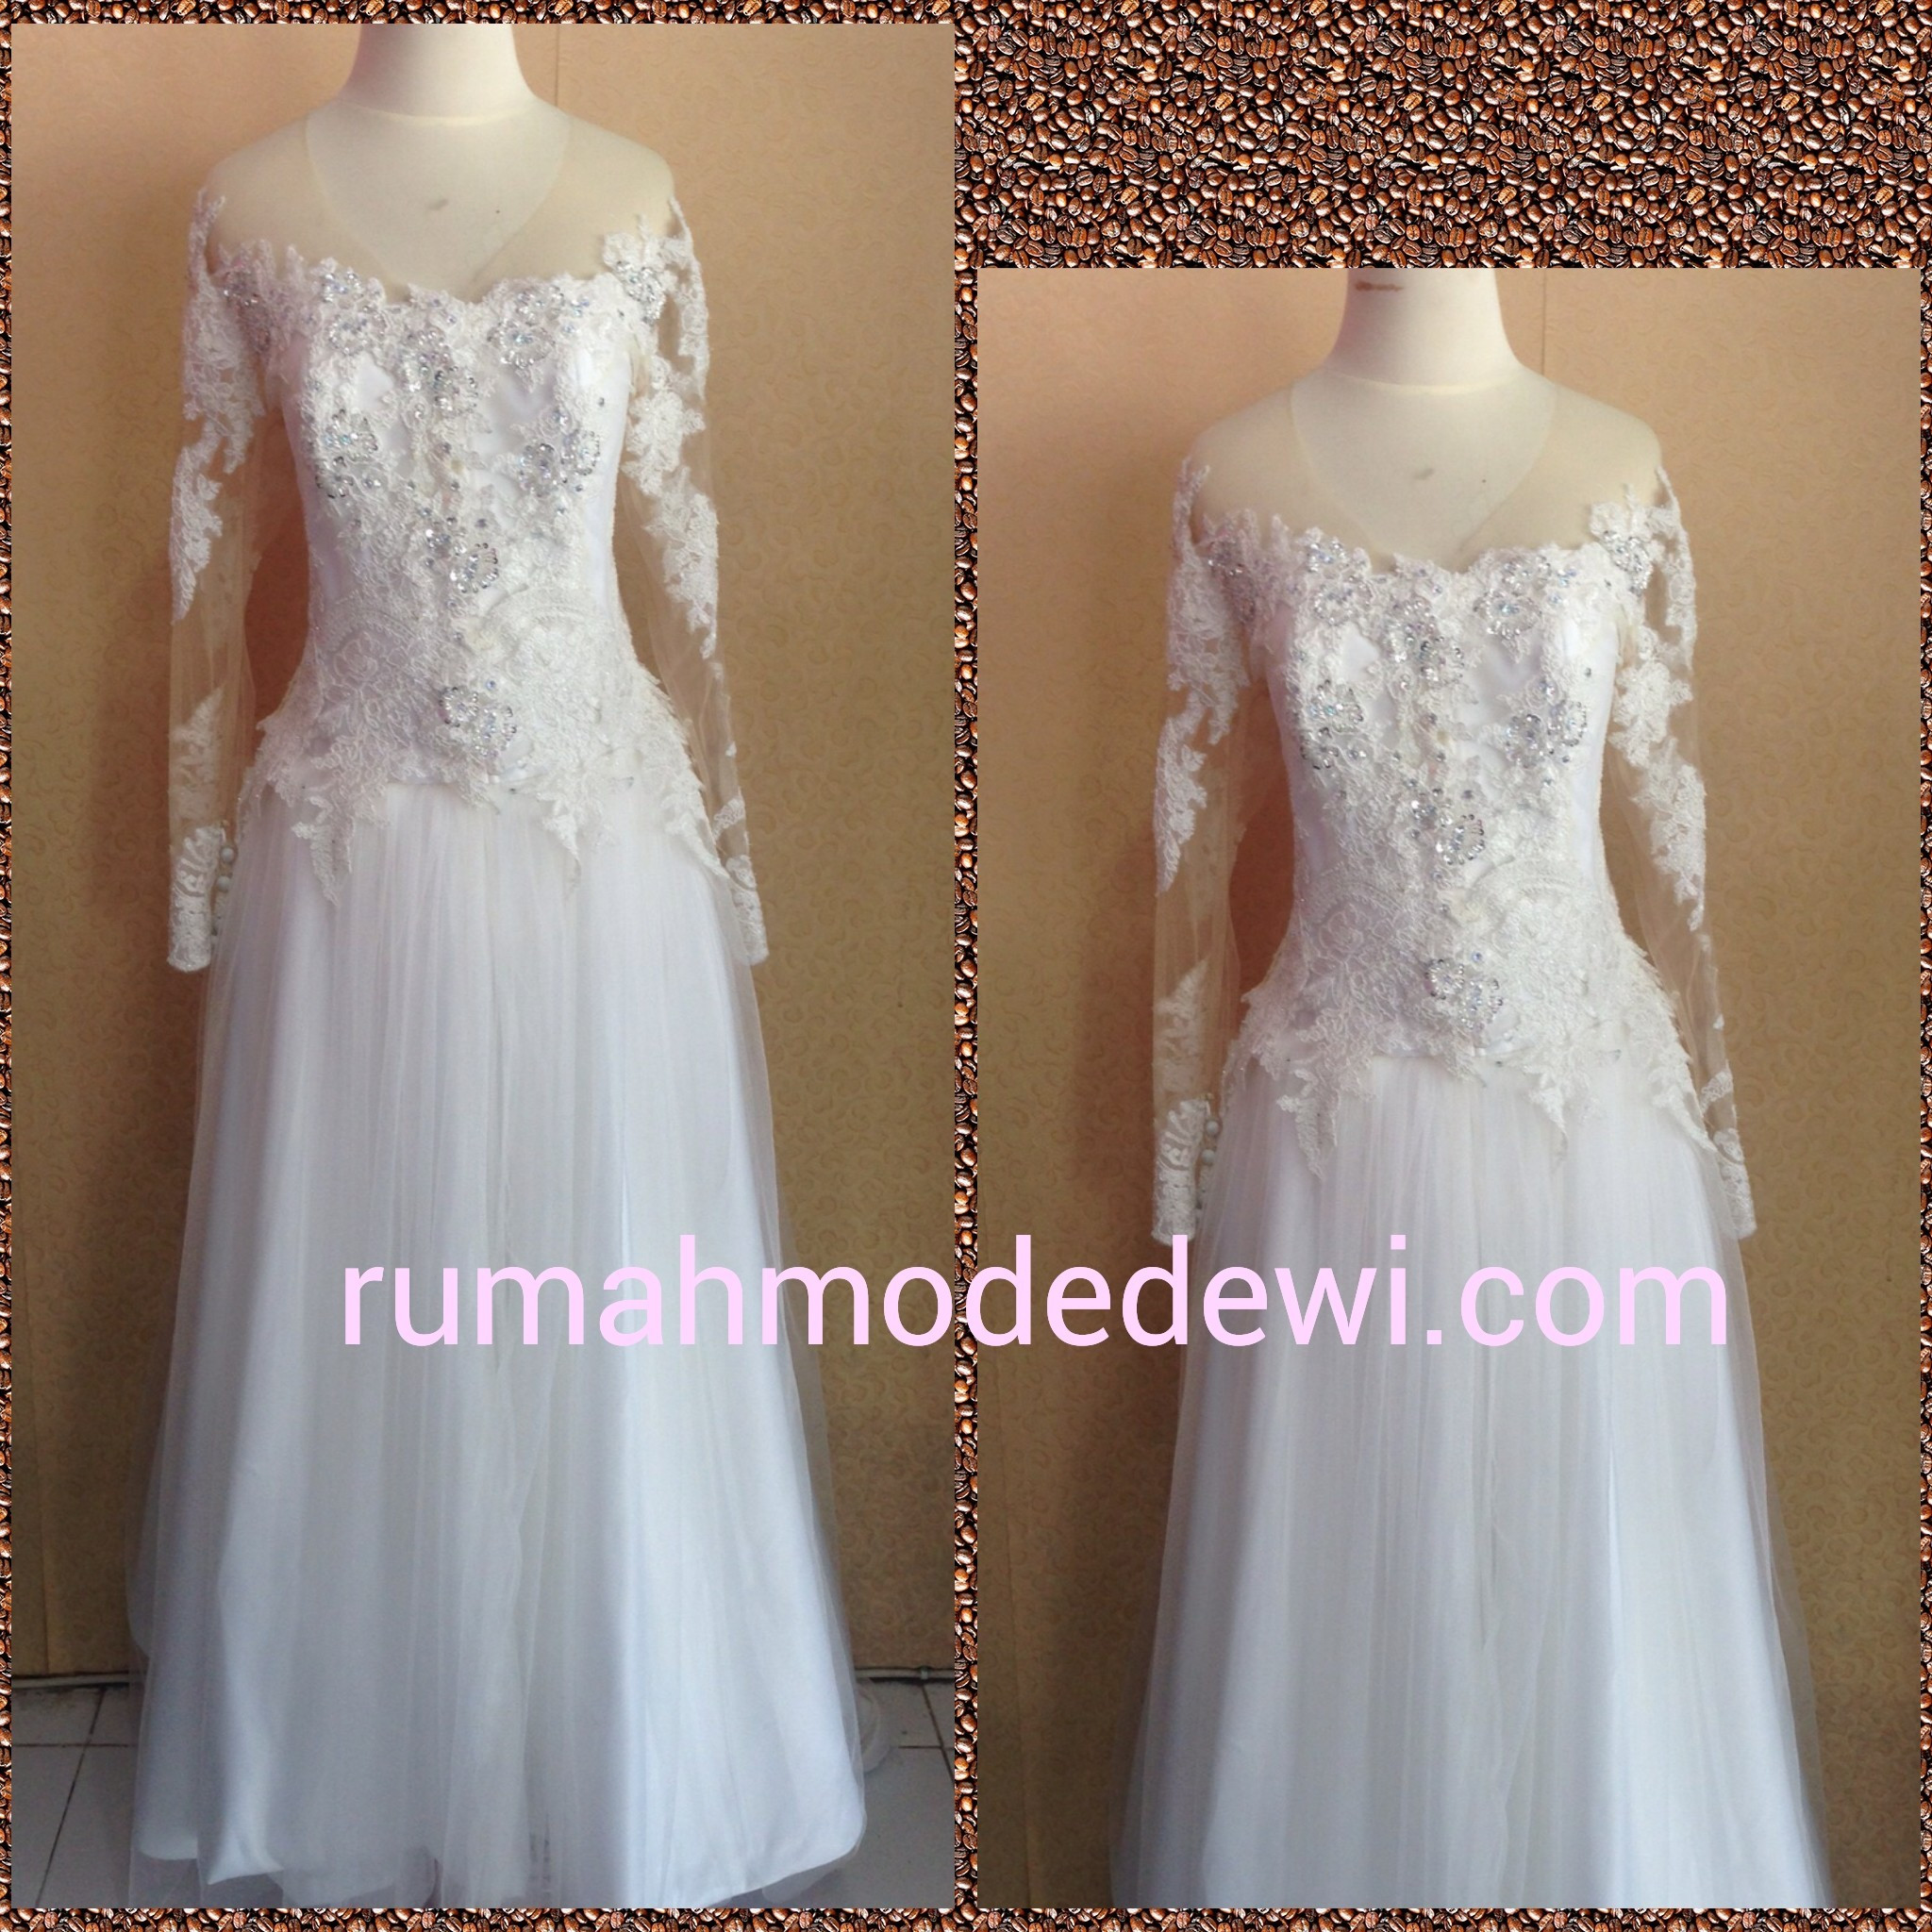 Gaun Pengantin Muslimah Putih Lovely Gaun Pengantin Muslimah Bagus Jual Mainboard W210cumb 0d